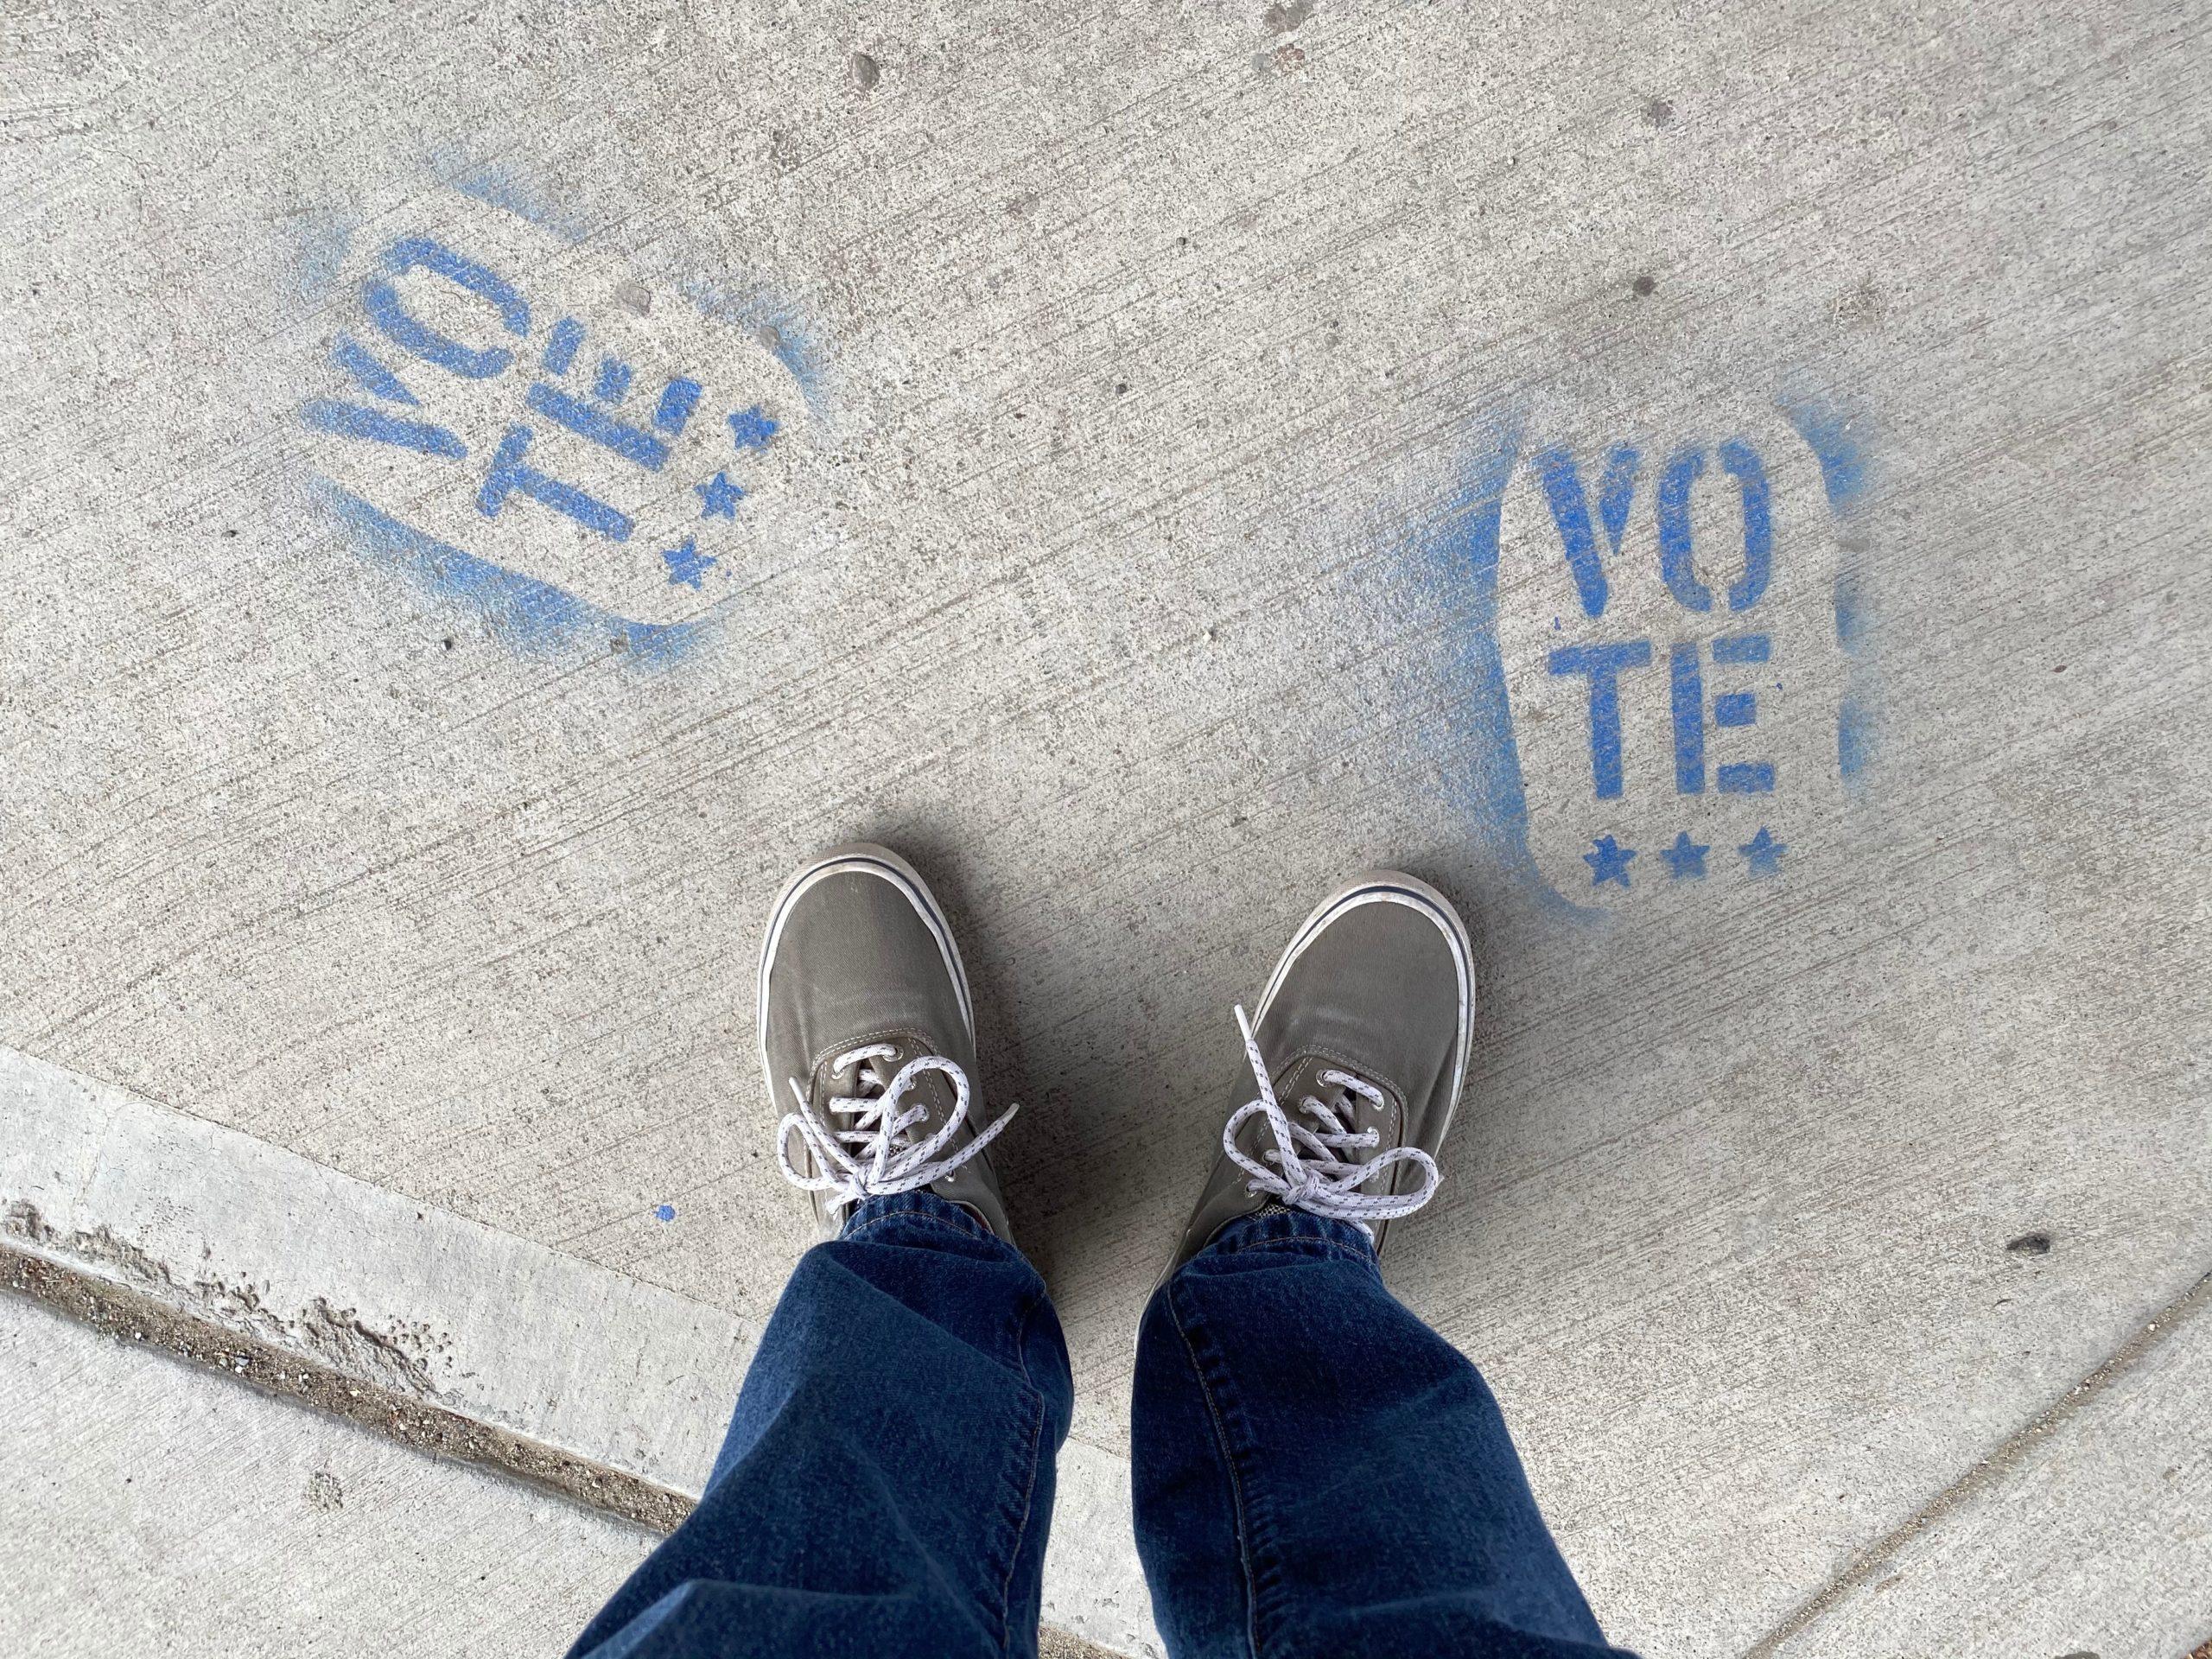 feet by vote signs on the sidewalk